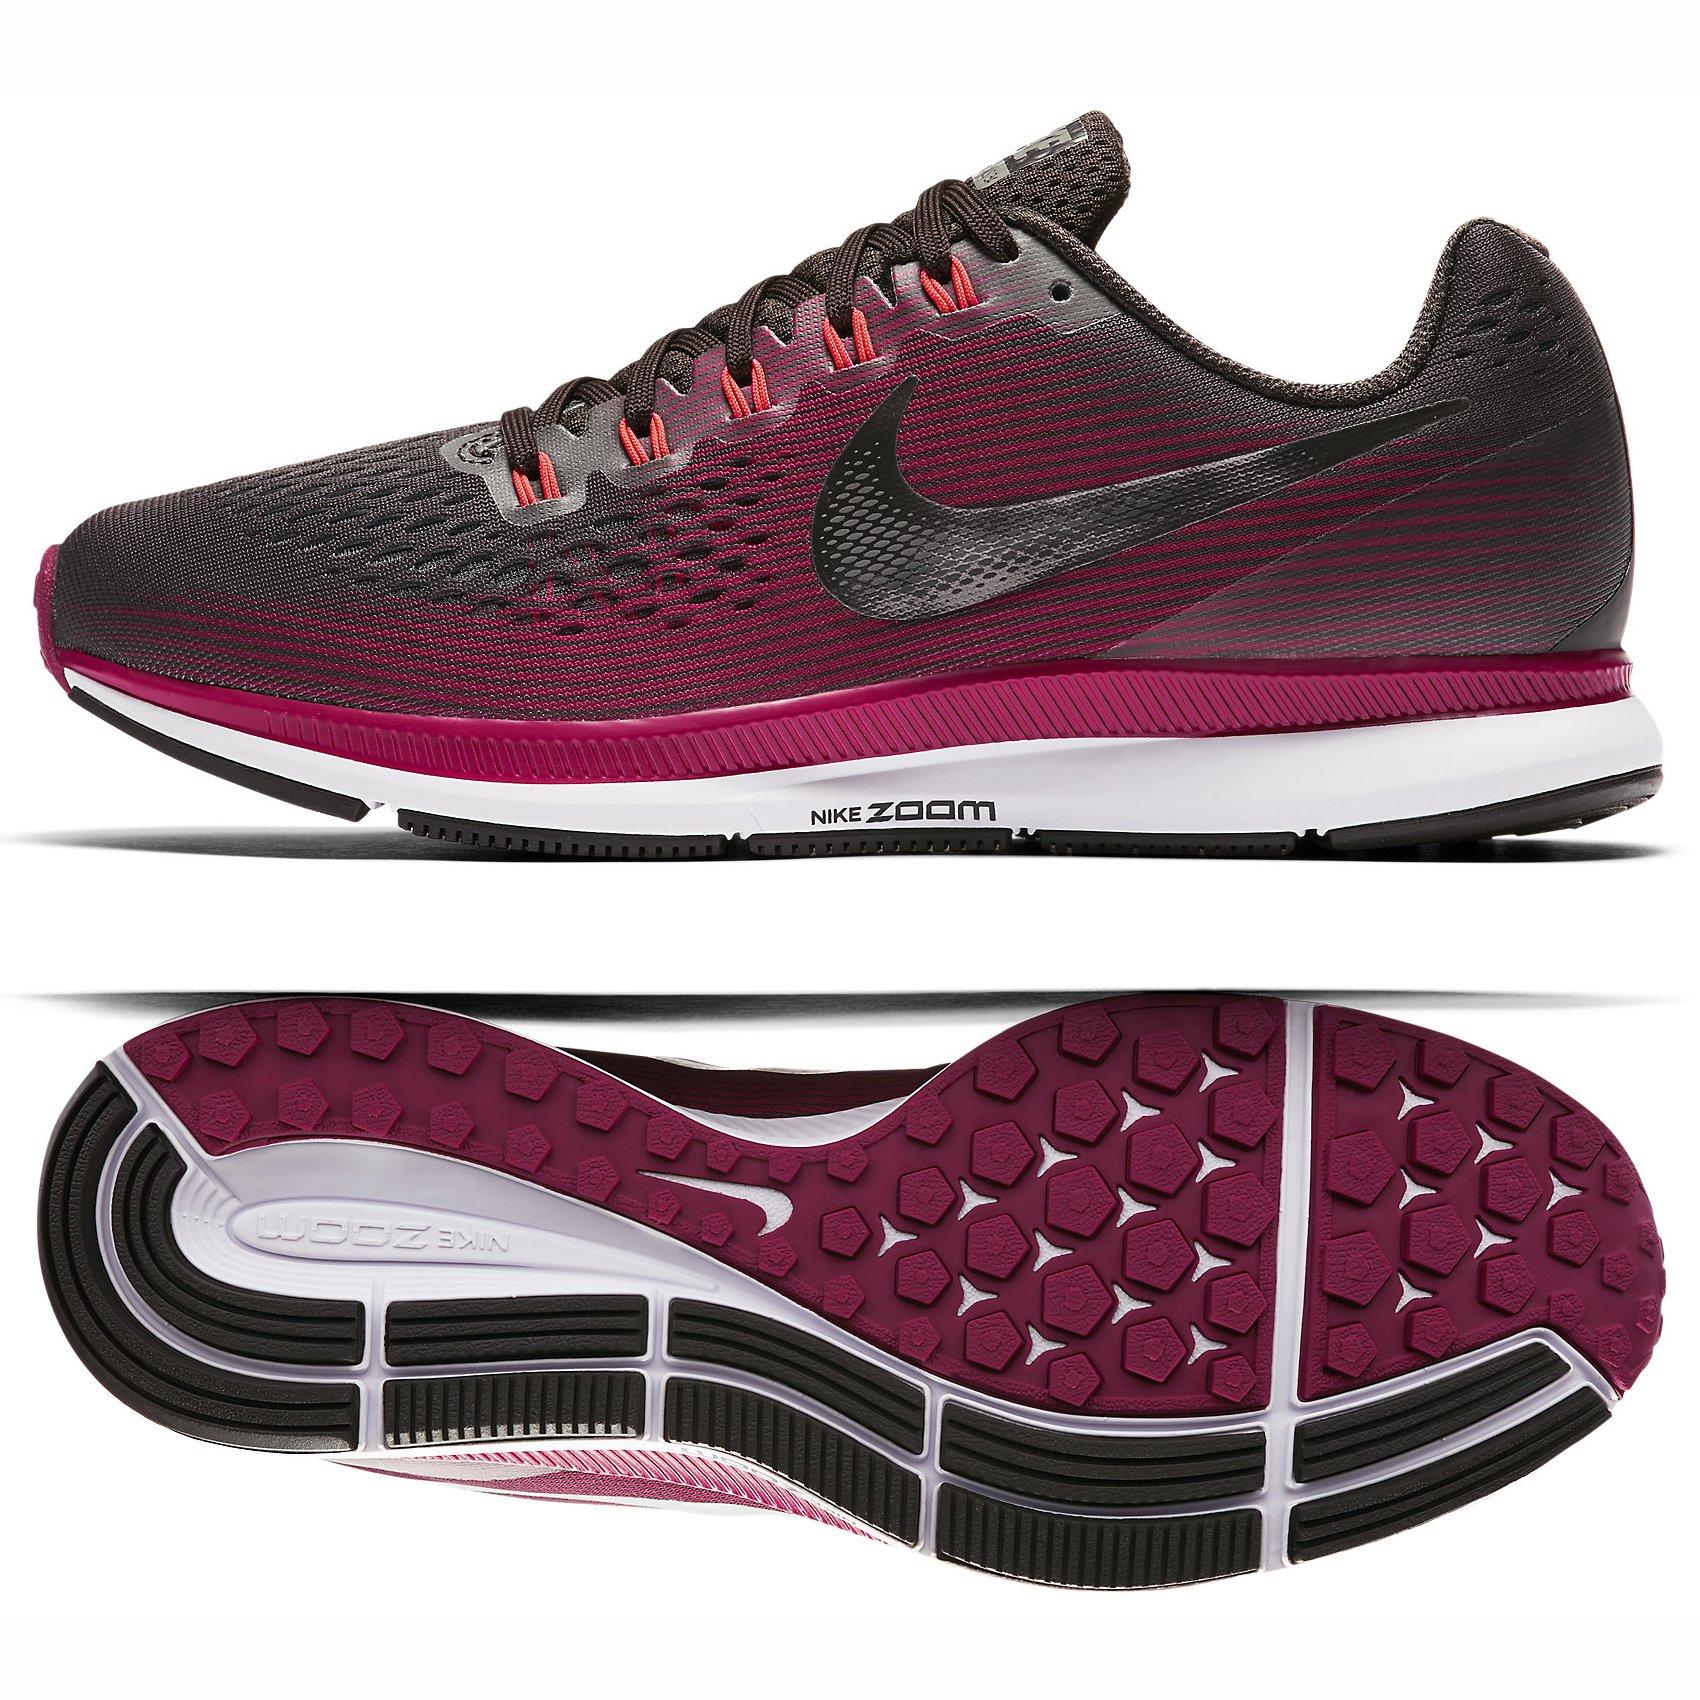 f32d5f782d6b8 Galleon - Nike Women s Air Zoom Pegasus 34 Running Shoe (Gem) Shadow Brown Metallic  Pewter Rush Maroon (8)